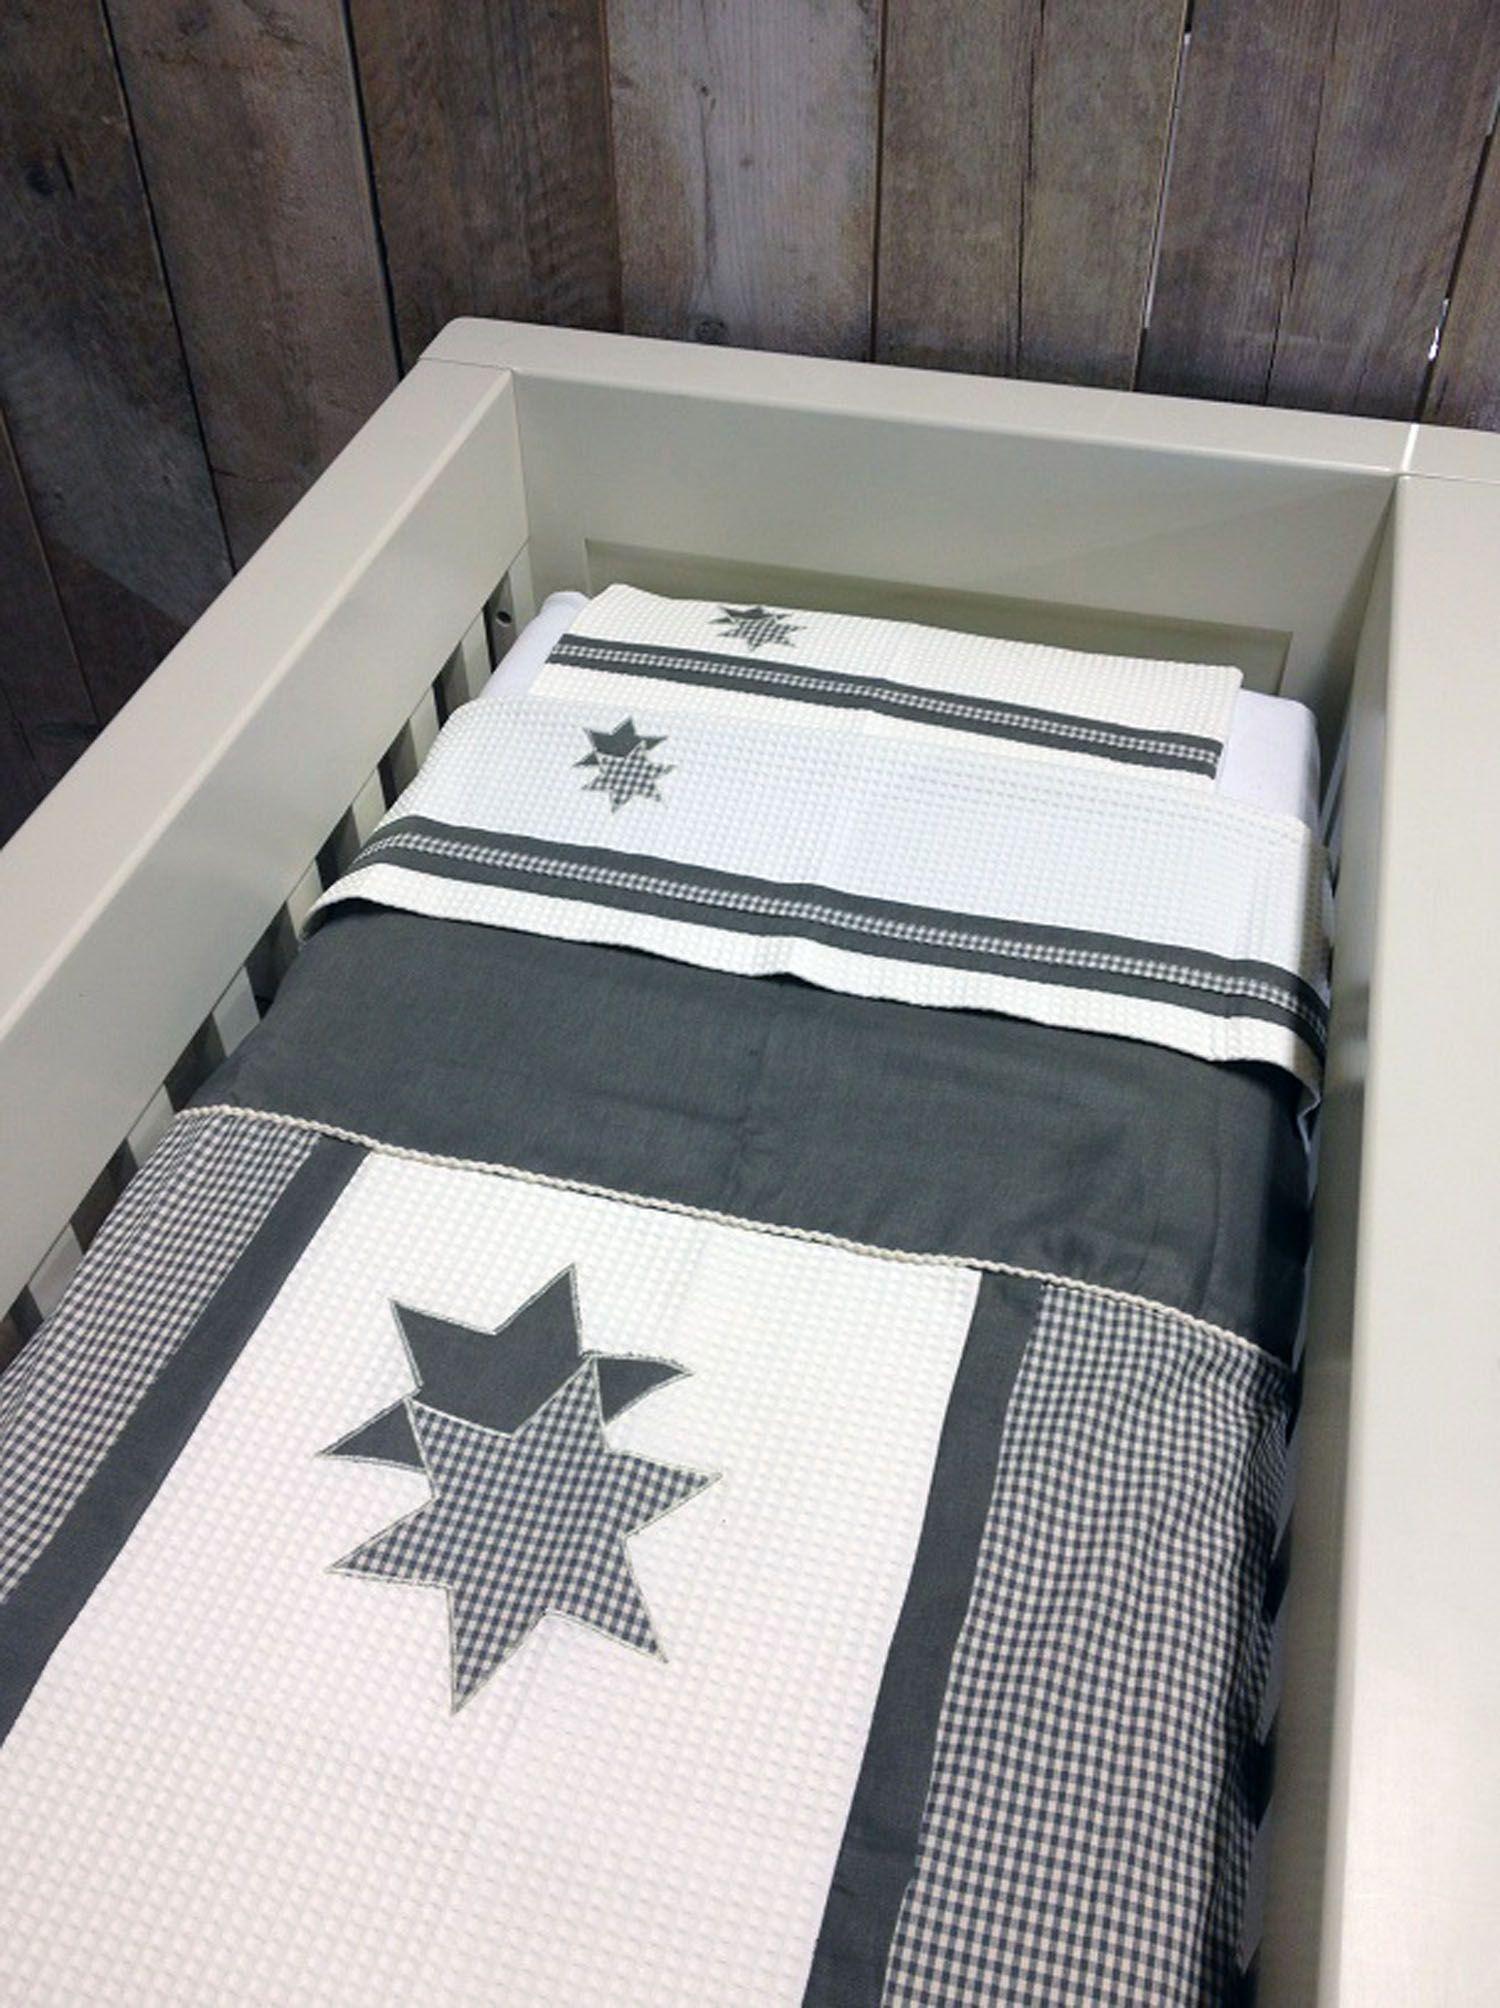 Complete Aankleding Babykamer.Grijs Lakentje In Ledikant In Babykamer Complete Aankleding